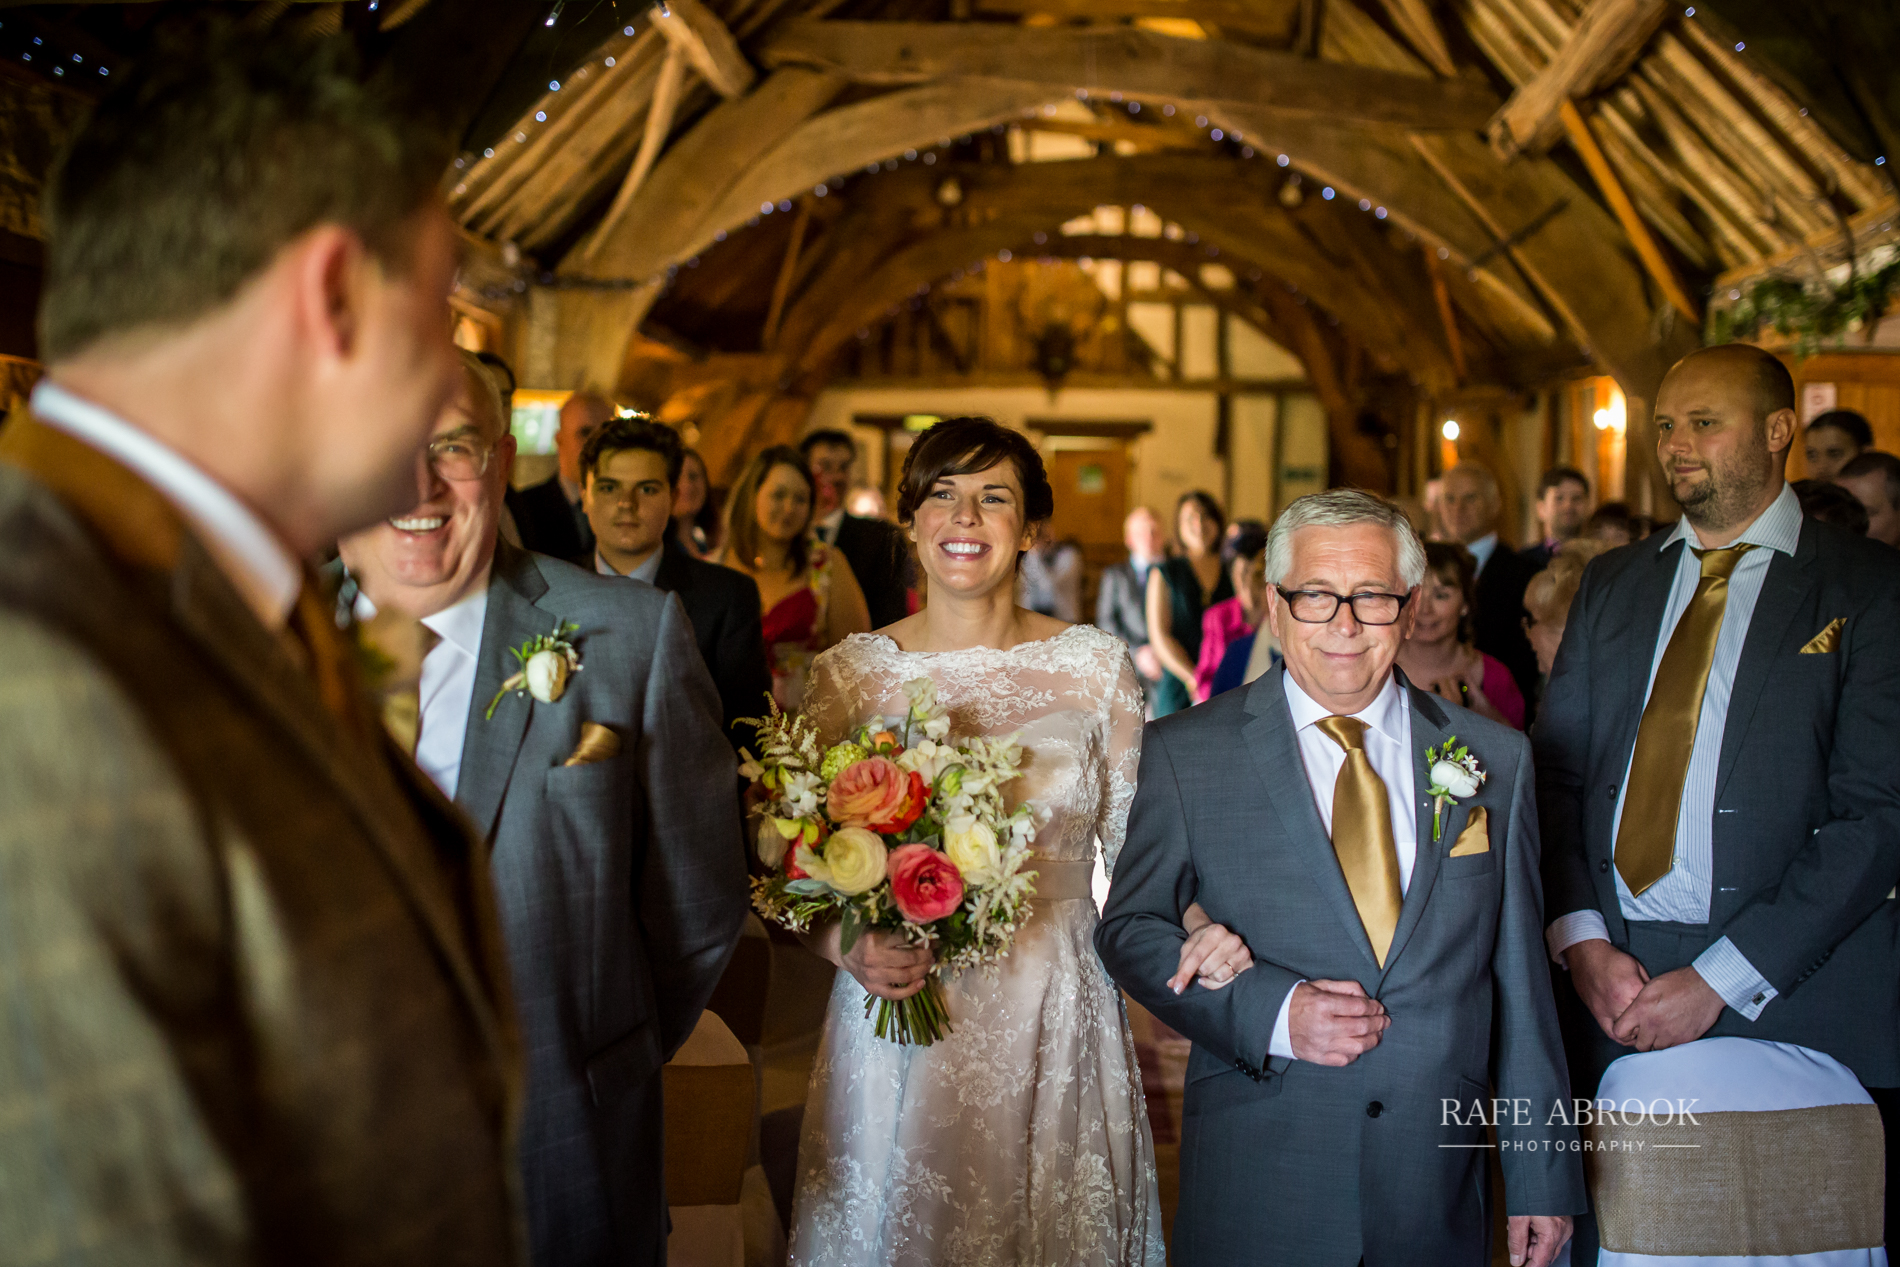 jon & laura wedding notley tythe barn wedding buckinghamshire-1155.jpg